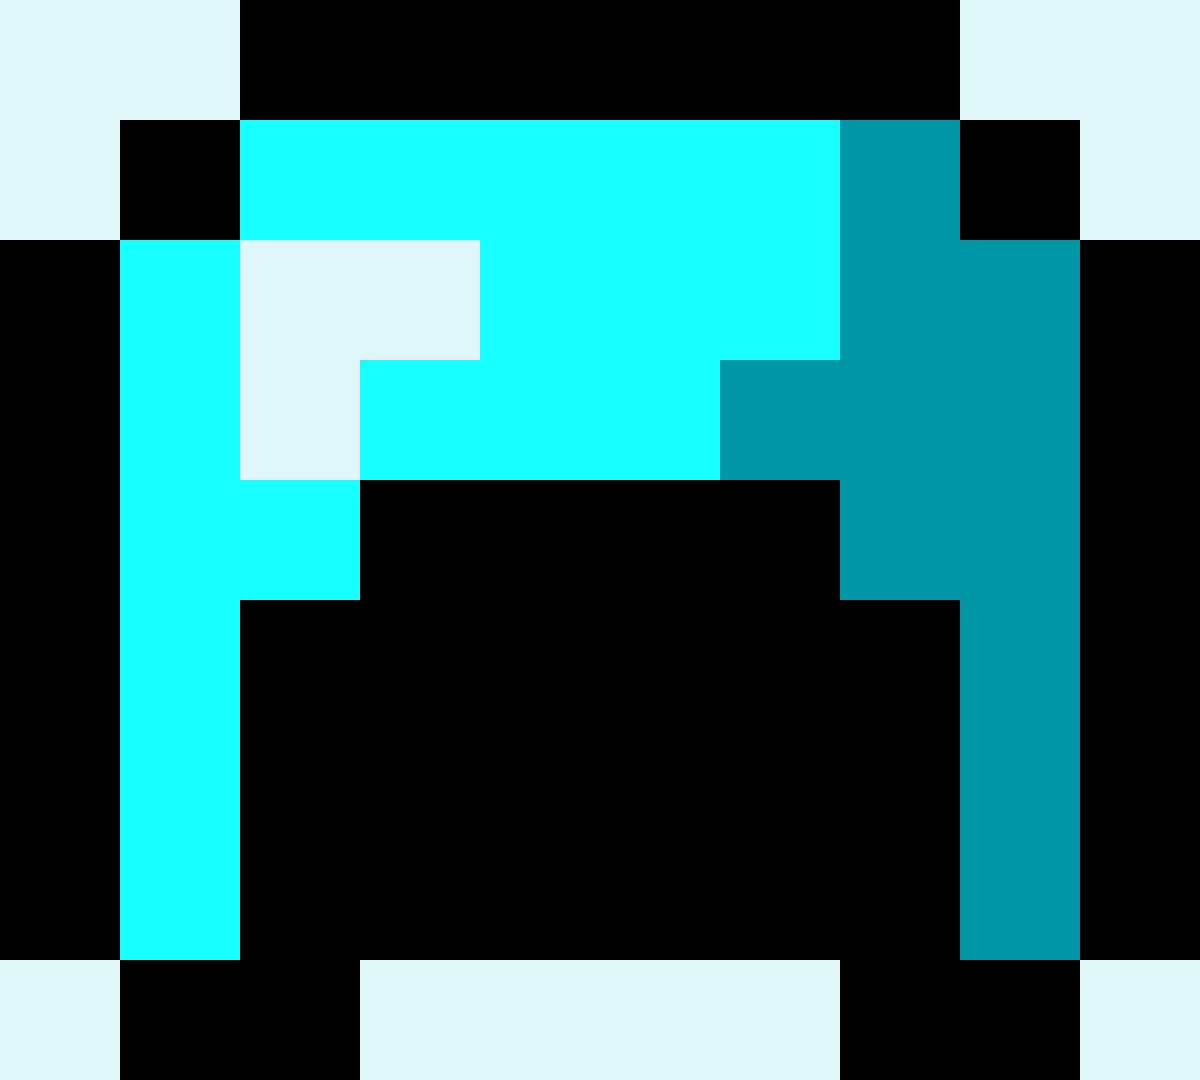 Pixilart - Minecraft Diamond Helmet By Death-drawer